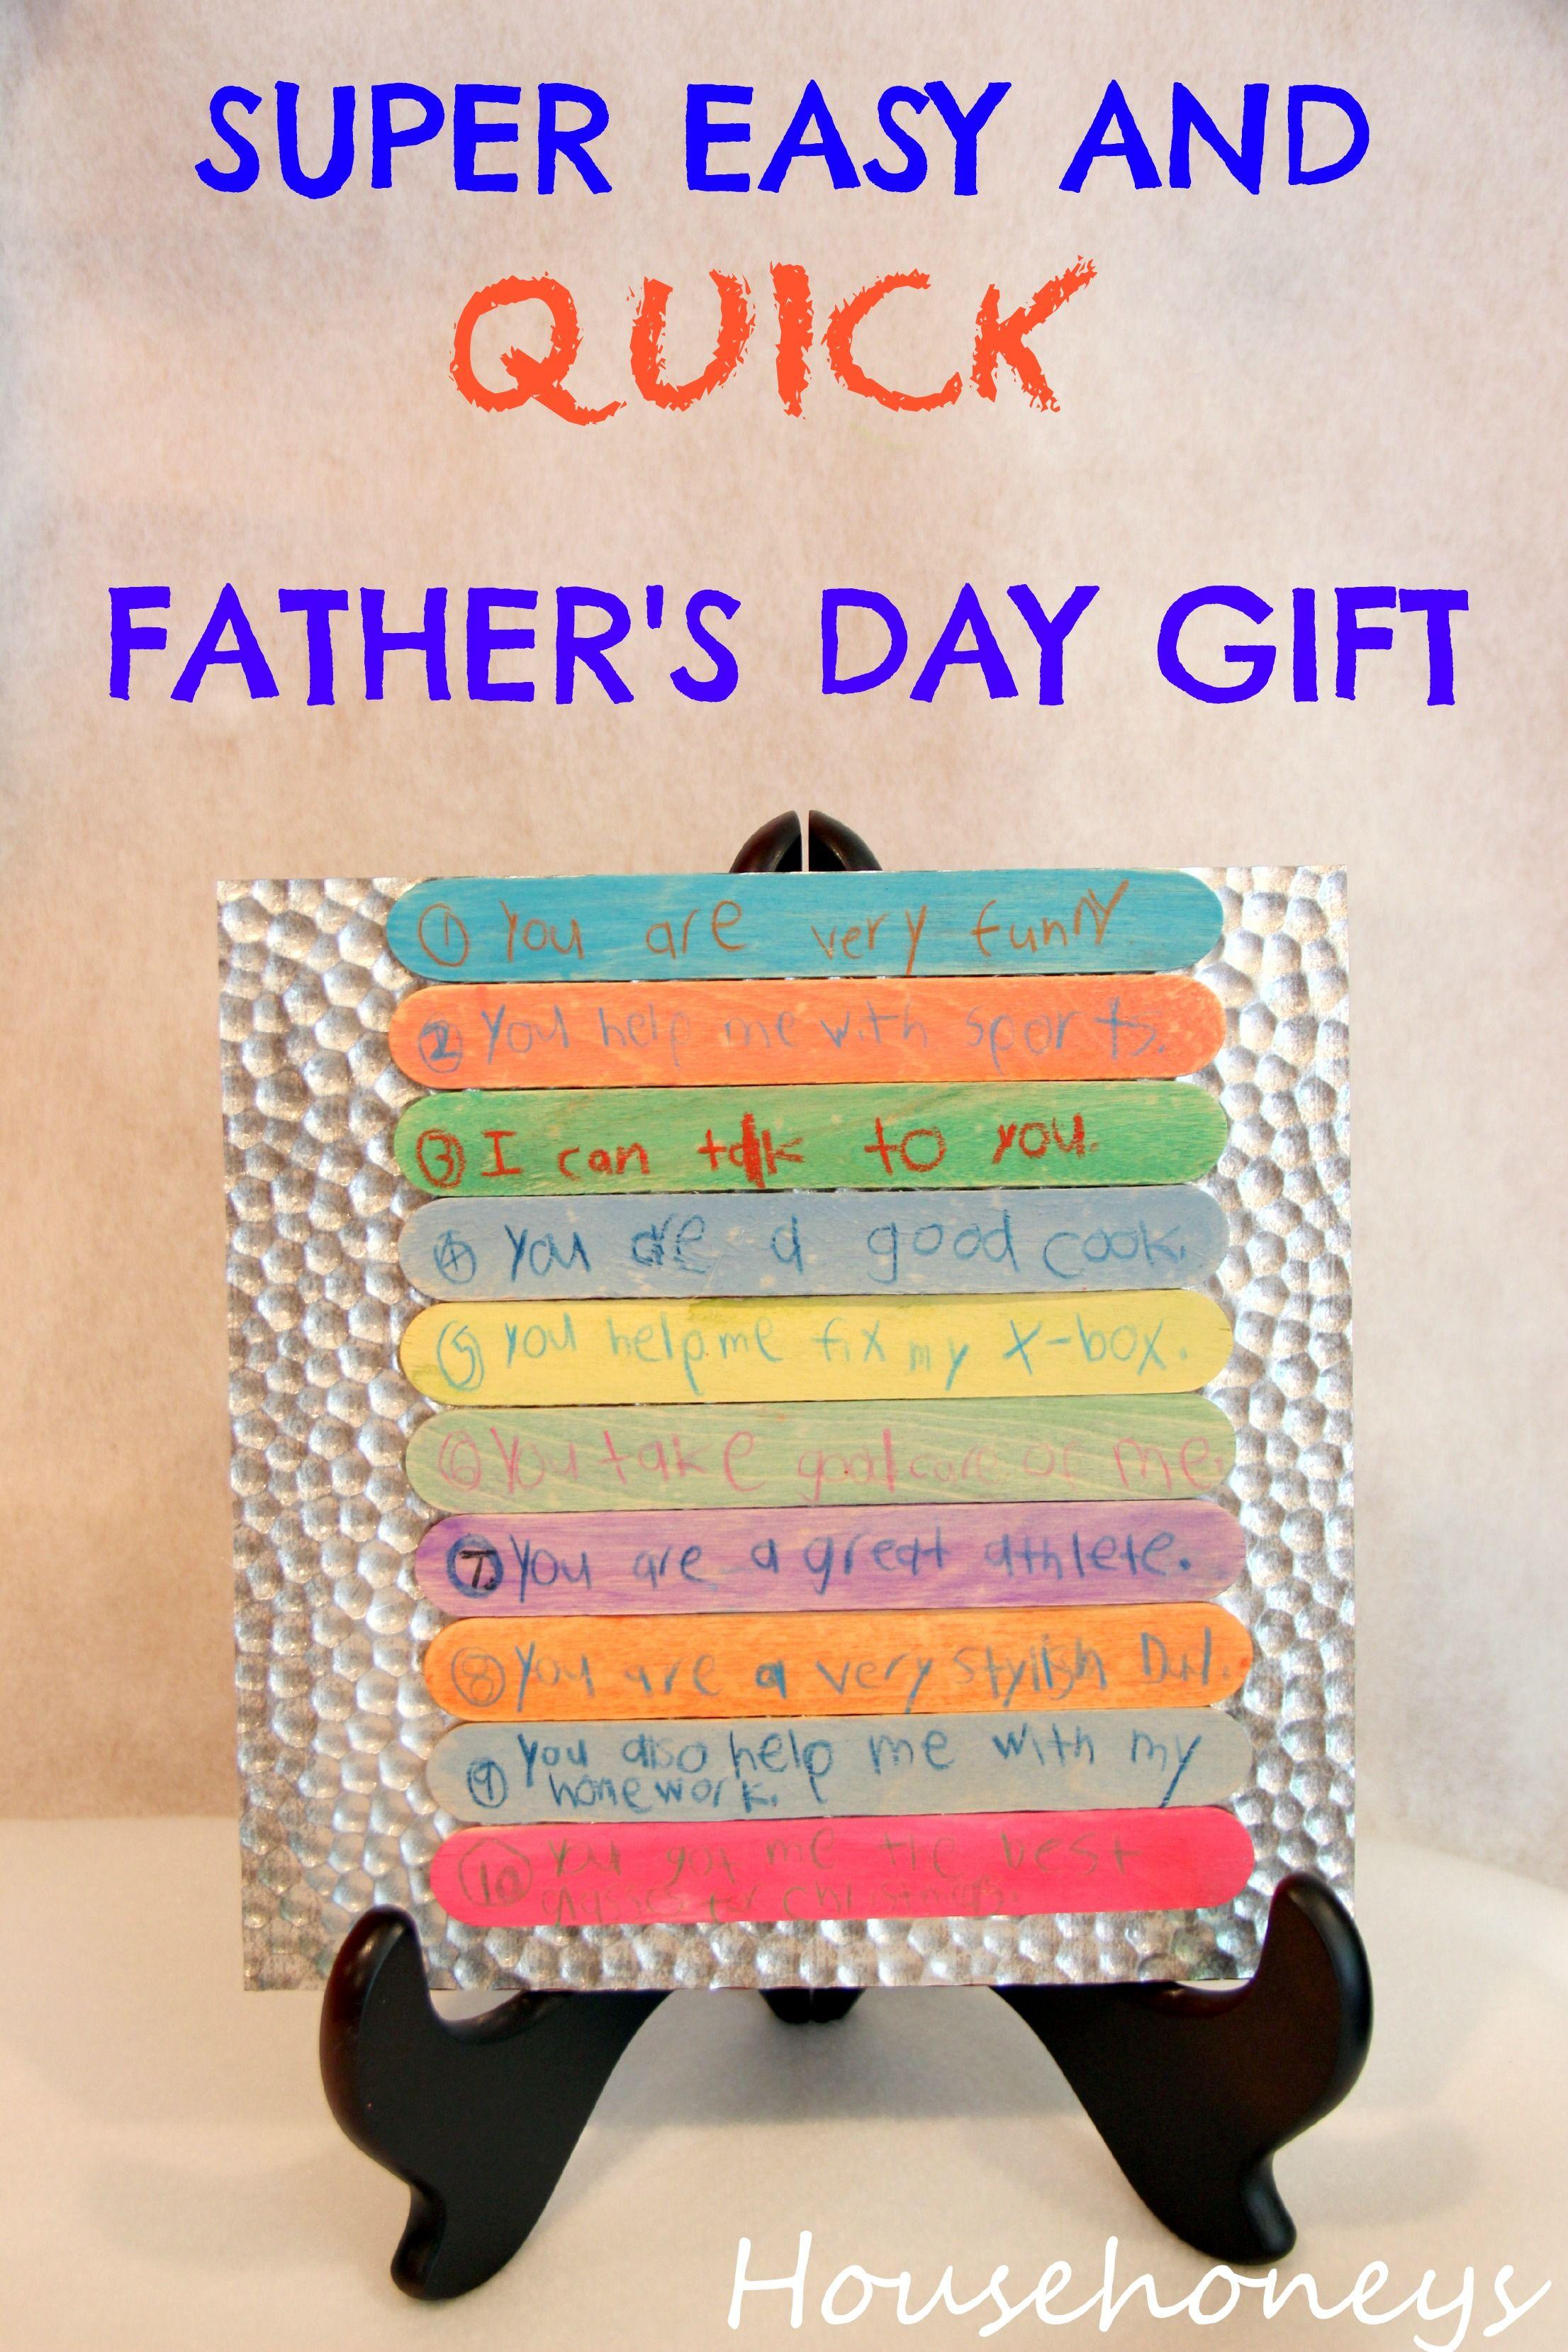 Easy Father S Day Gift Gunstige Vatertagsgeschenke Vatertag Alles Gute Zum Vatertag